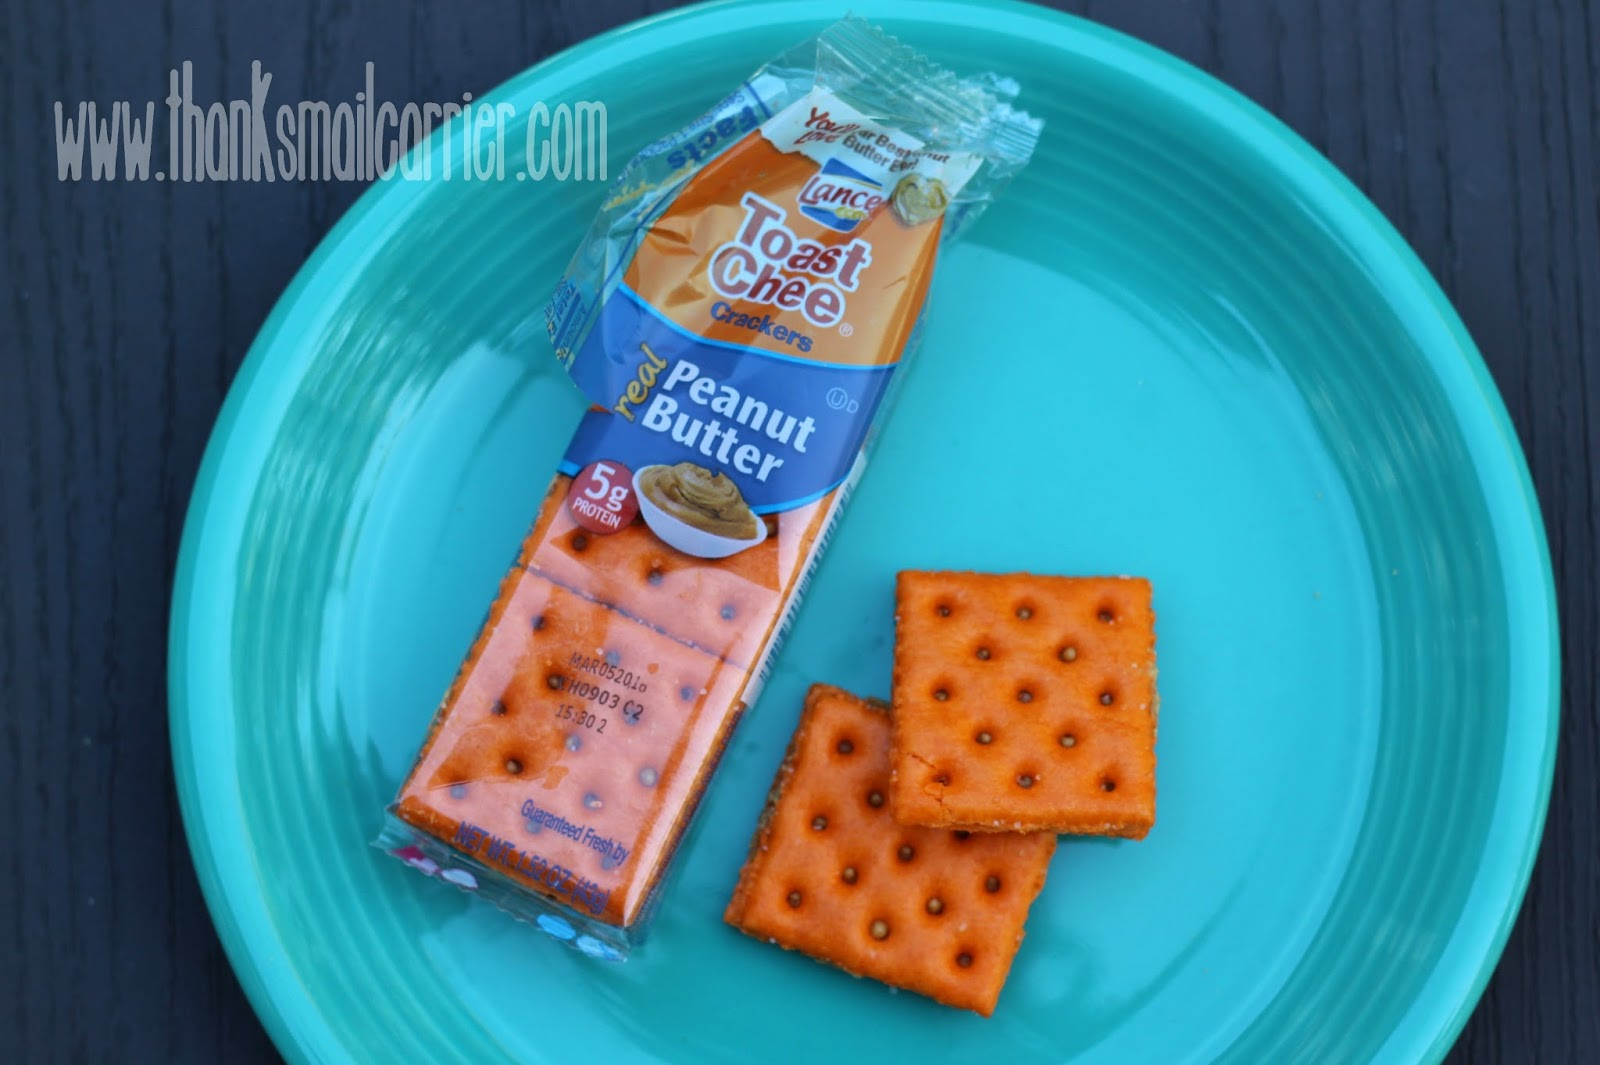 Lance Peanut Butter ToastChee